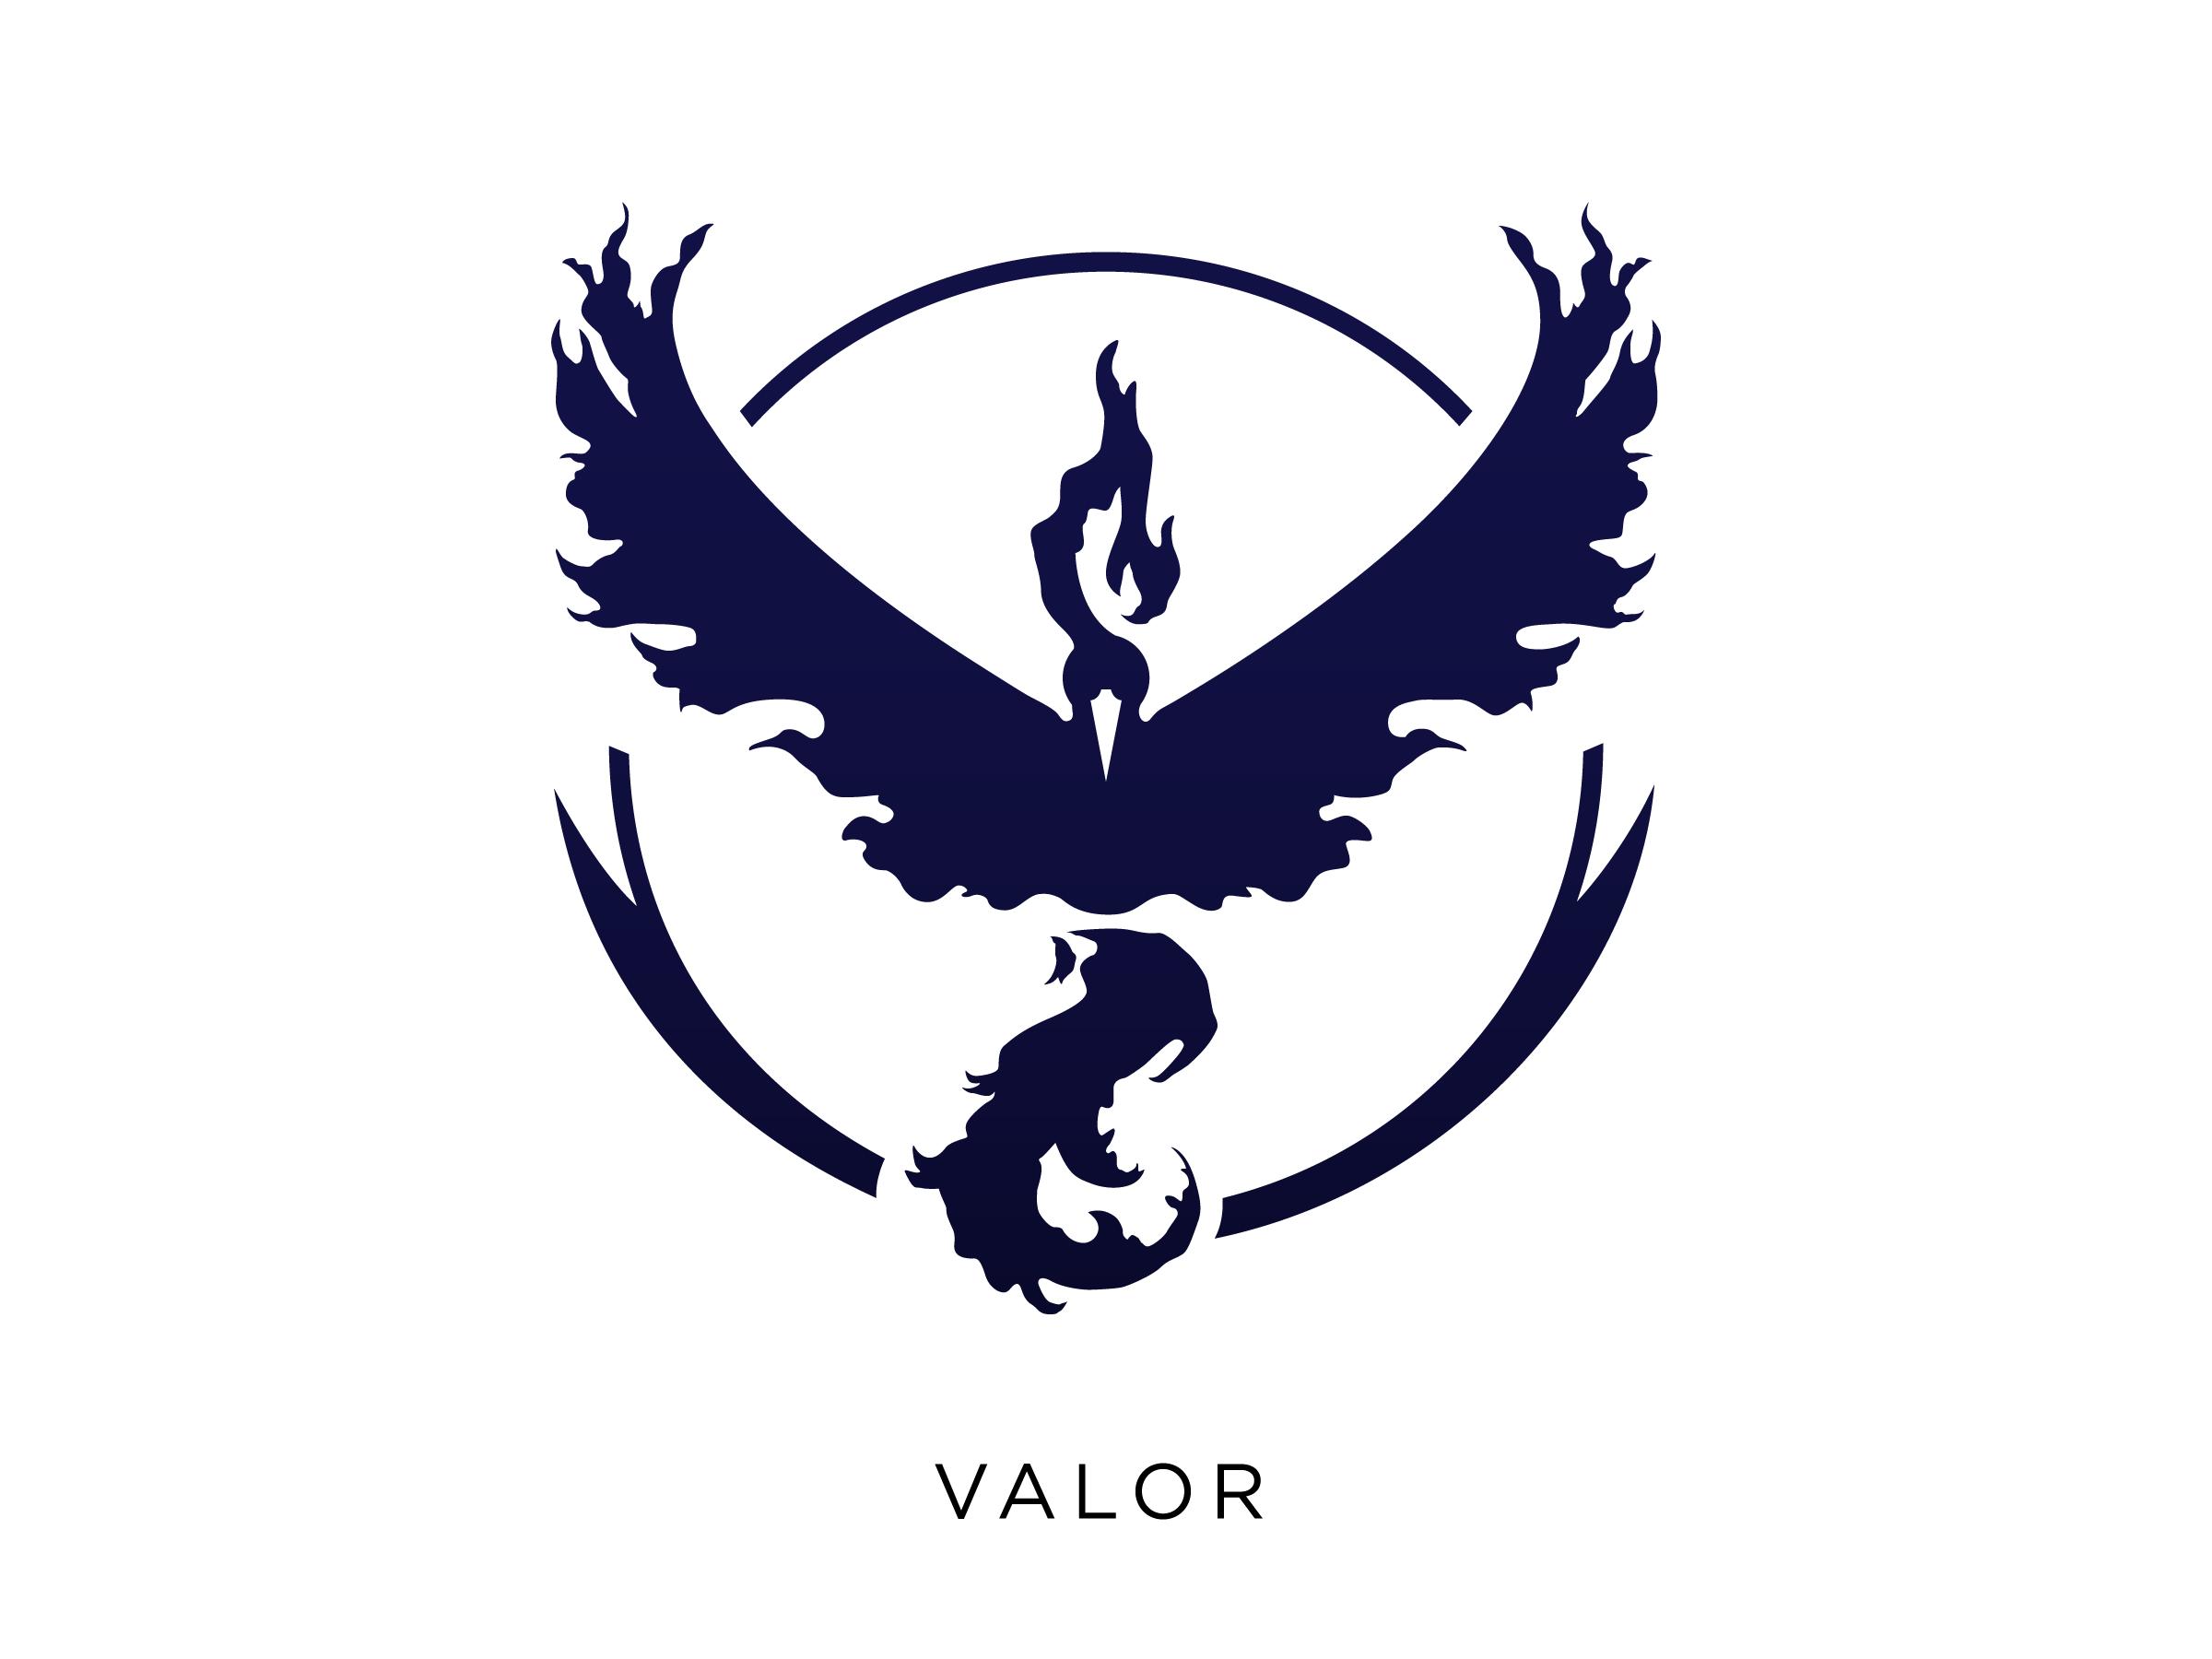 . PlusPng.com Pokemongo team logos valor - Pokemon Company Logo Vector PNG